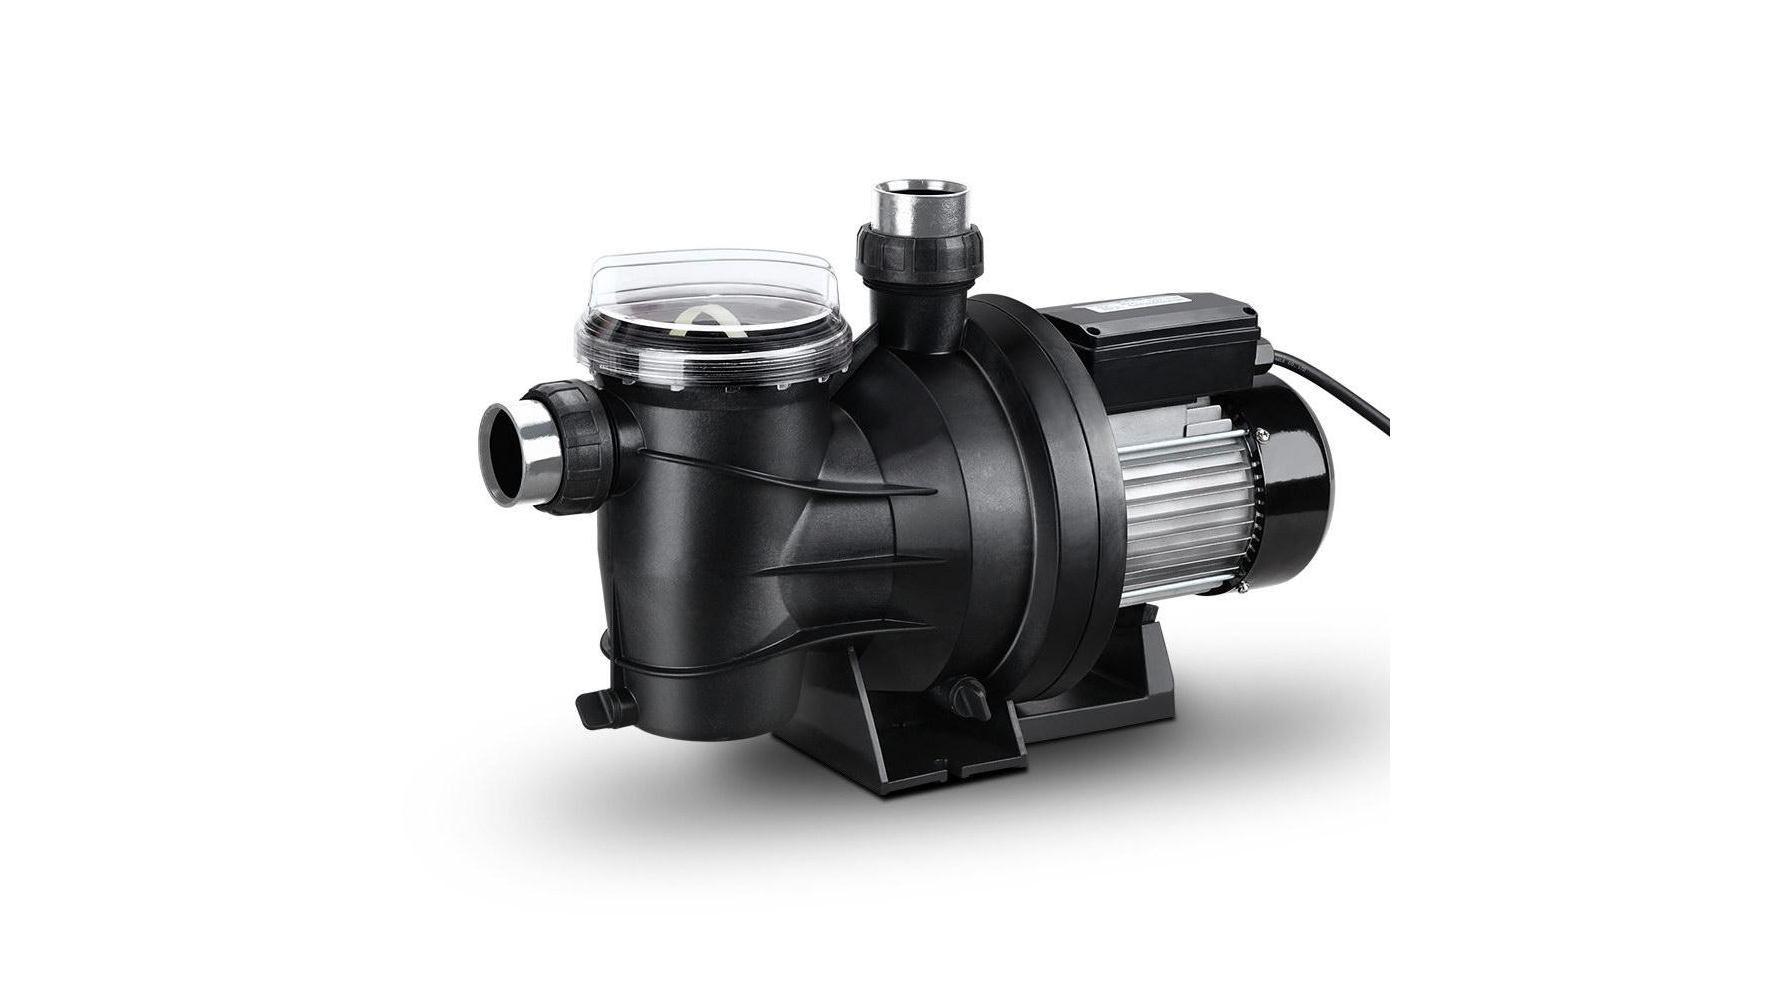 Giantz 2000W Swimming Pool Water Pump